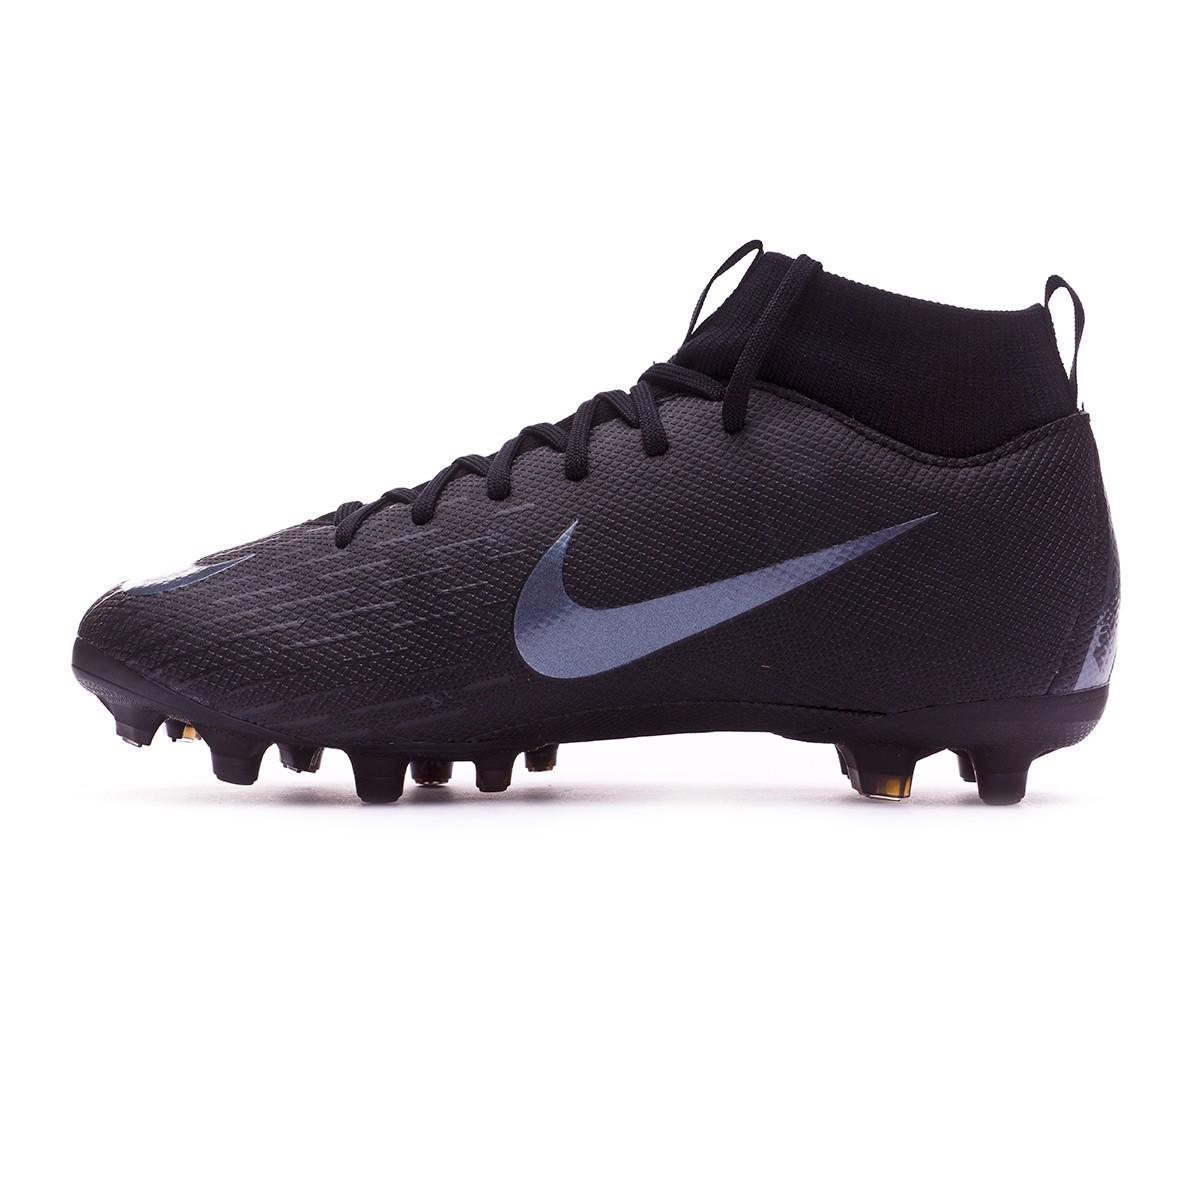 14877394c Football Boots Nike Kids Mercurial Superfly VI Academy GS MG Black - Tienda  de fútbol Fútbol Emotion